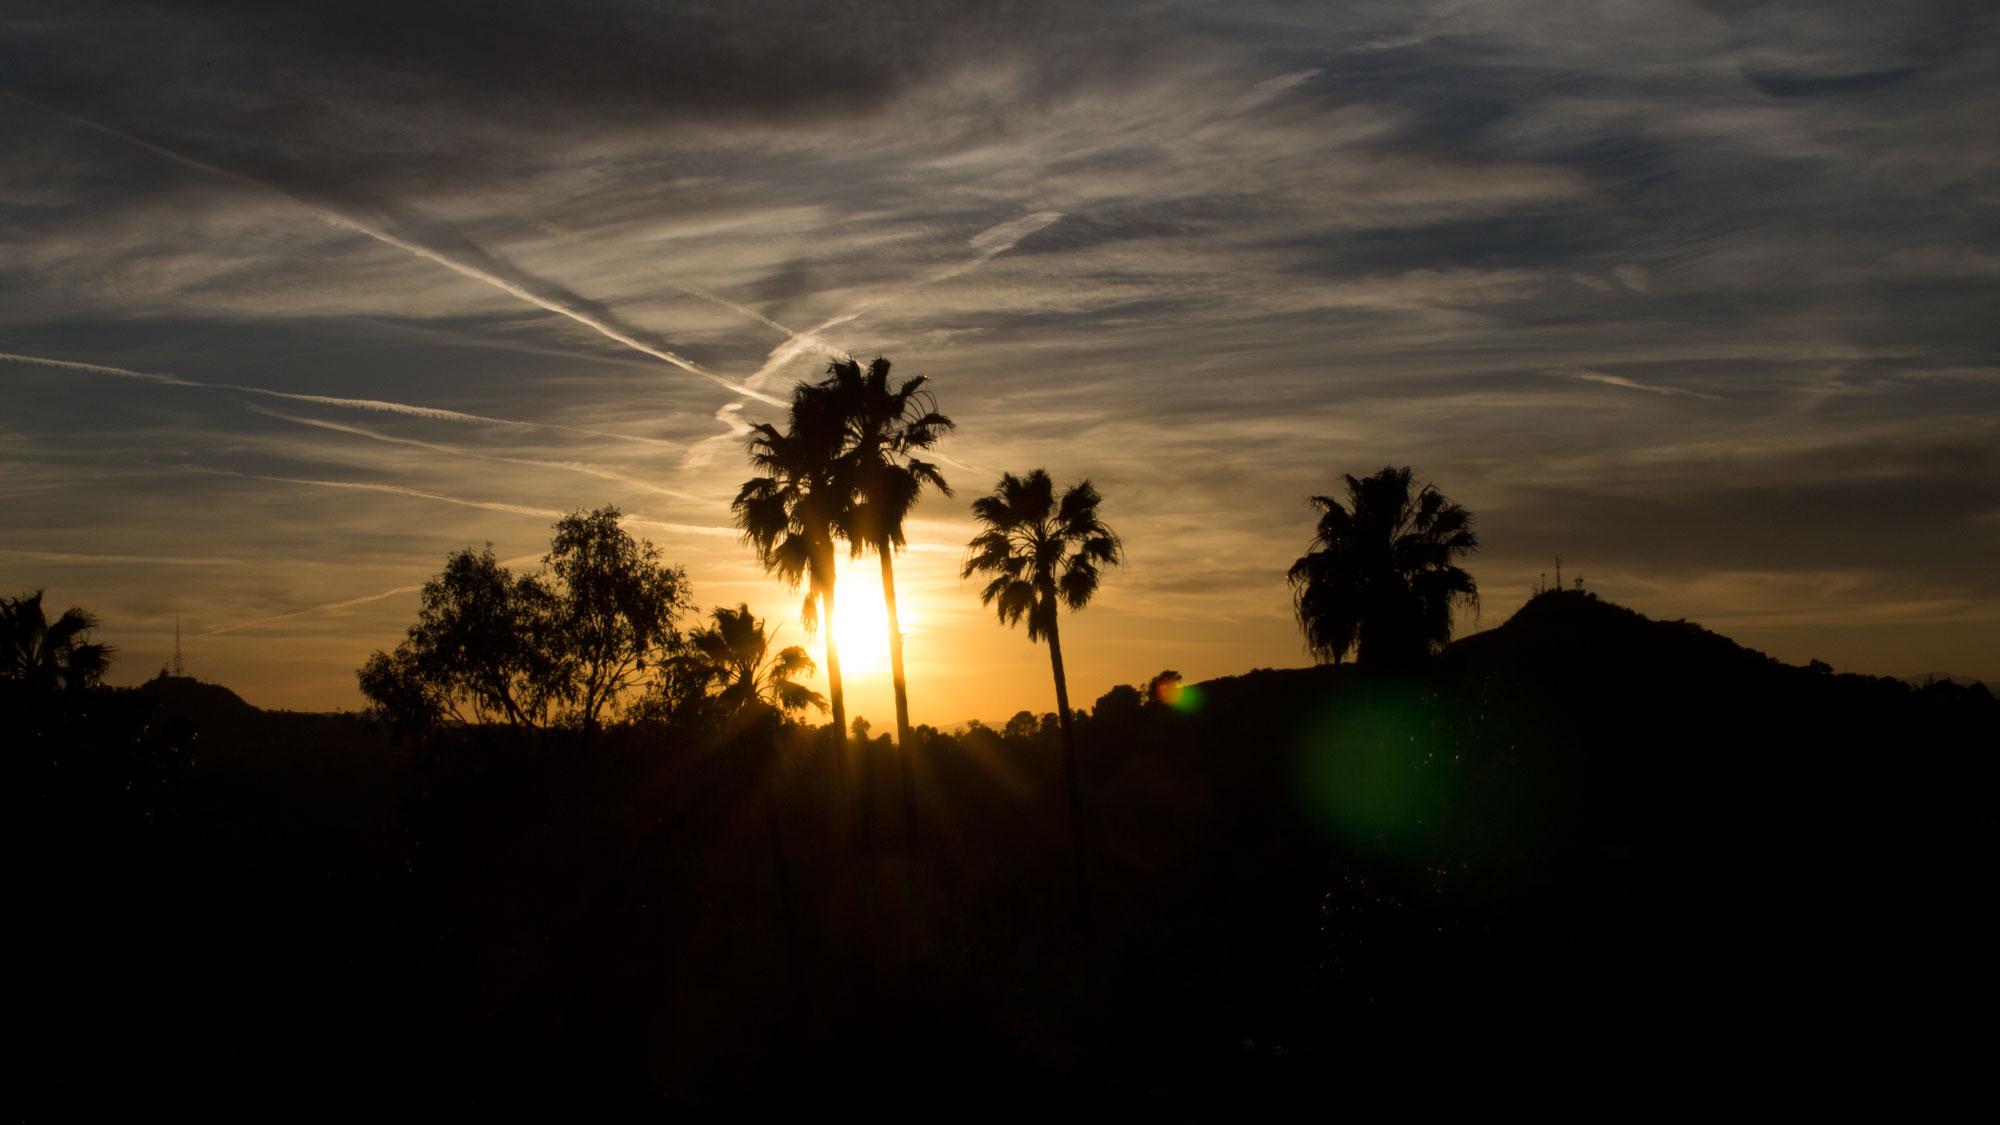 Runyon Canyon, Los Angeles | United States